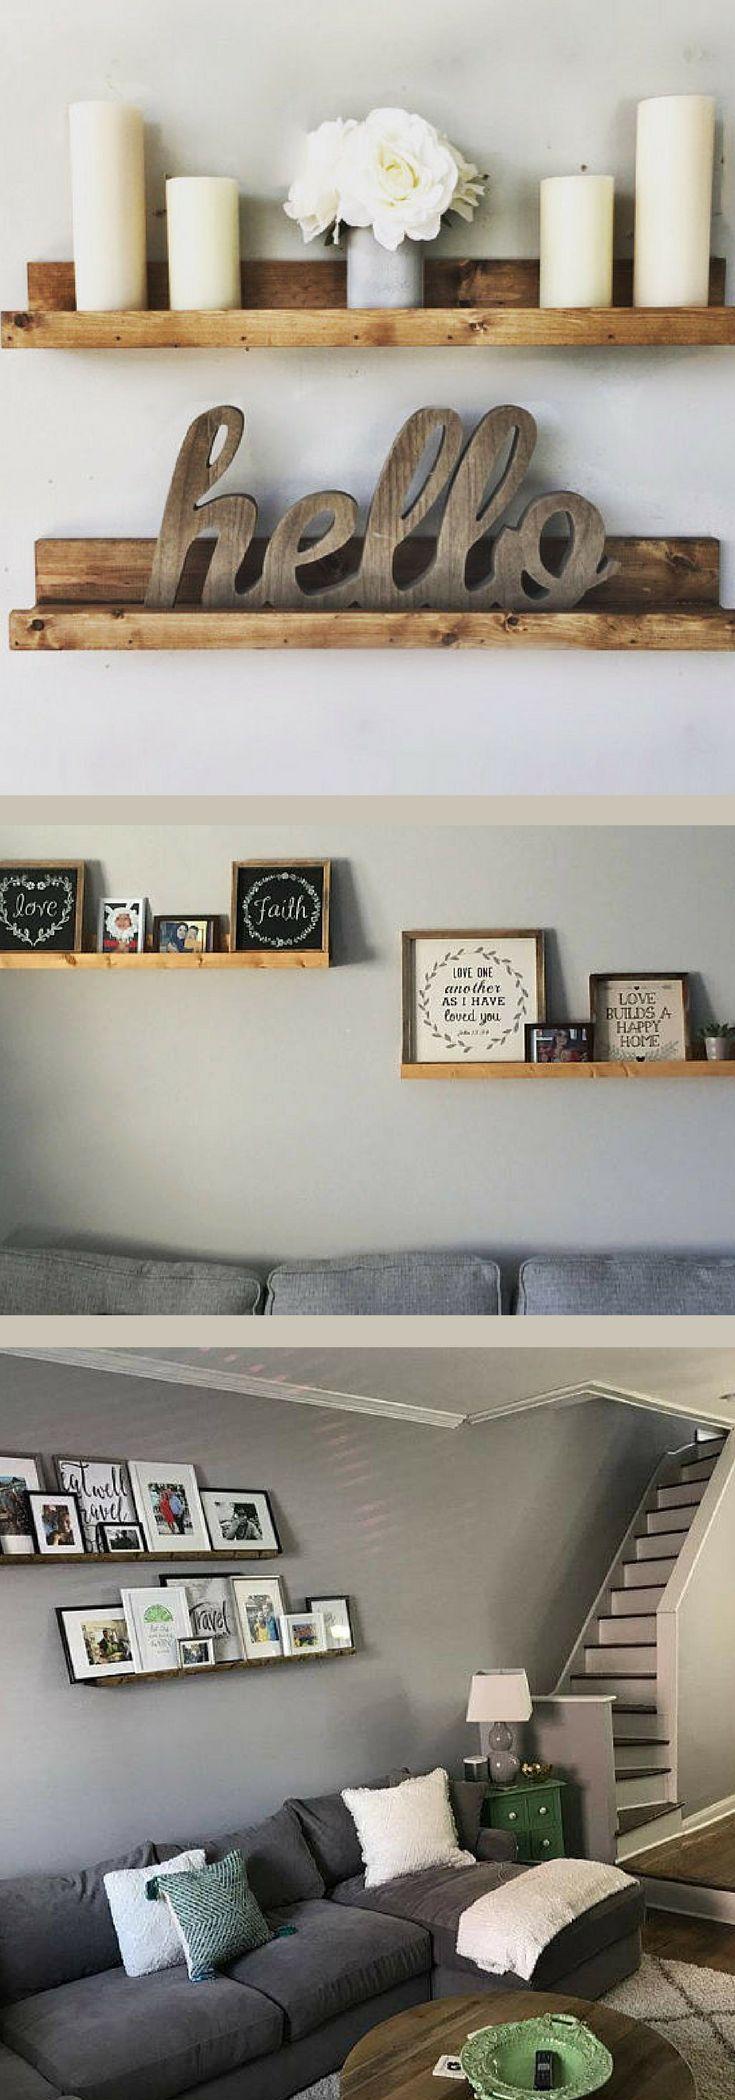 Ledge Style Shelf for Pictures or Books - Floating Shelves, Wall Shelf, Picture Ledge Shelf, Gallery Shelf, Nursery, Bookshelf, Modern Farmhouse Decor, Rustic Decor, Fixer Upper Decor, Rustic Farmhouse, Farmhouse Fixer Upper, Gallery Wall, Book Ledge, Wooden Wall Shelf, Display Shelf, Display Ledge #ad